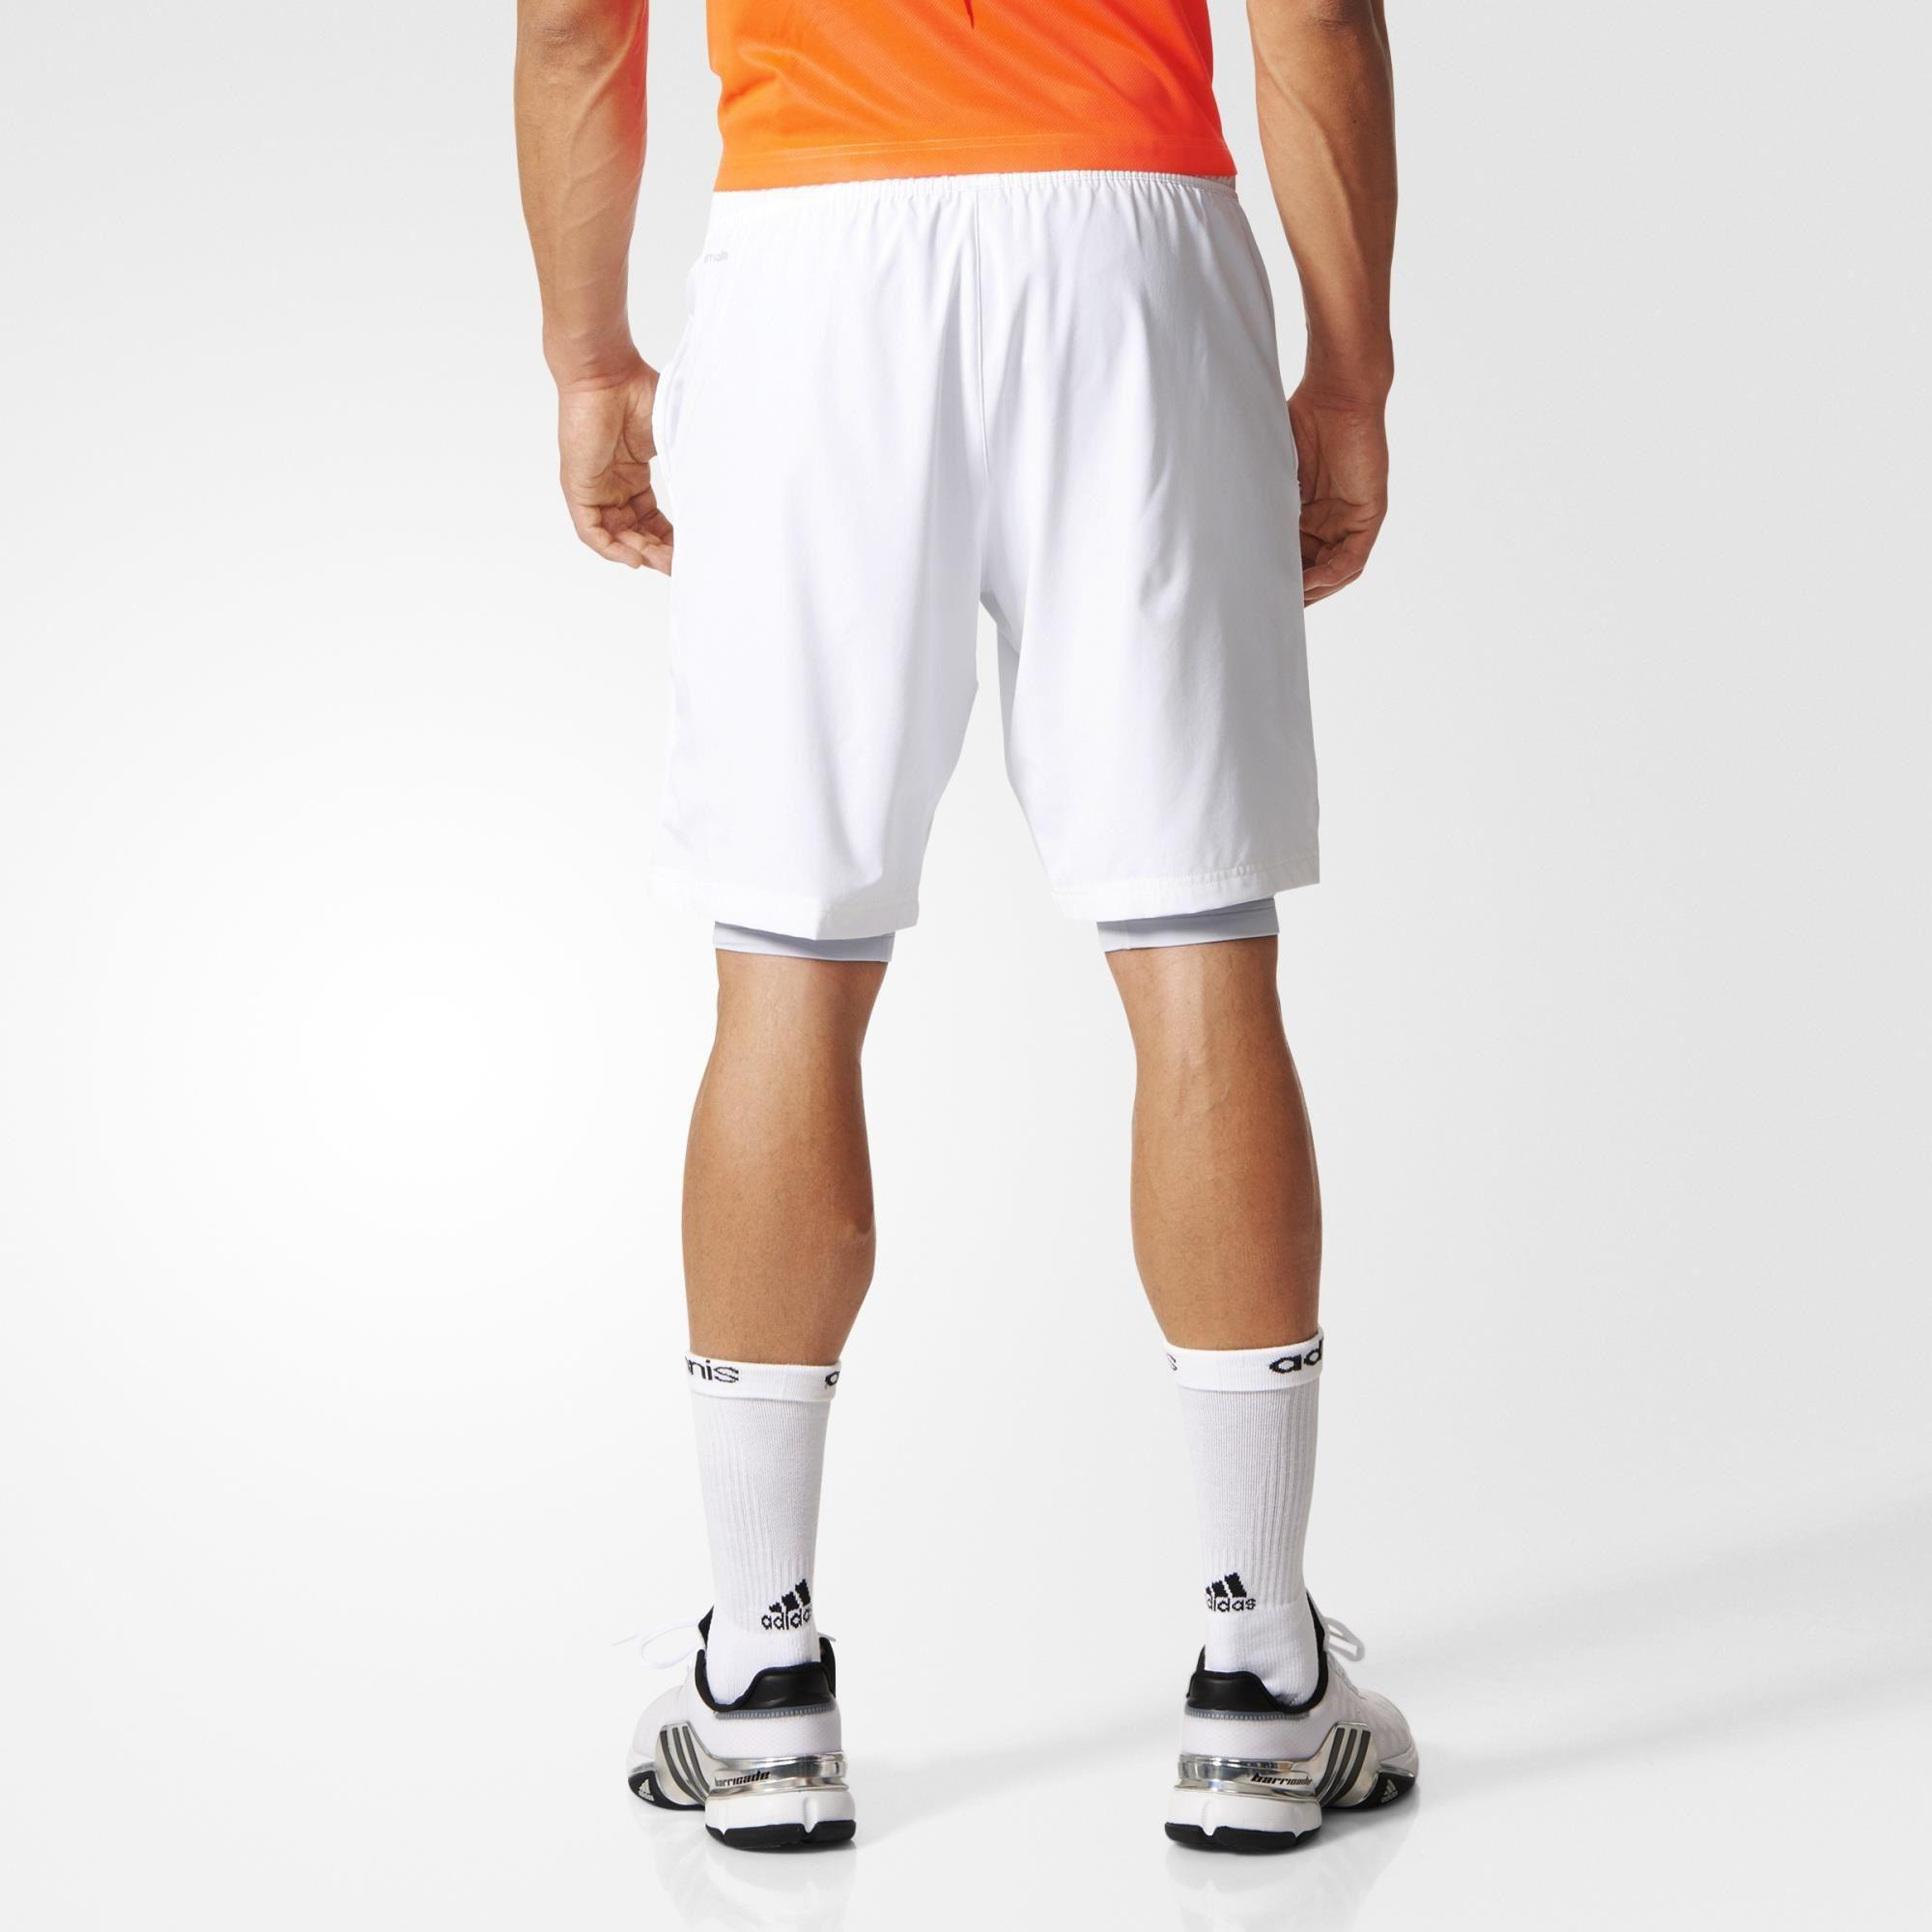 Adidas Mens Adizero 2in1 Bermuda Shorts - White